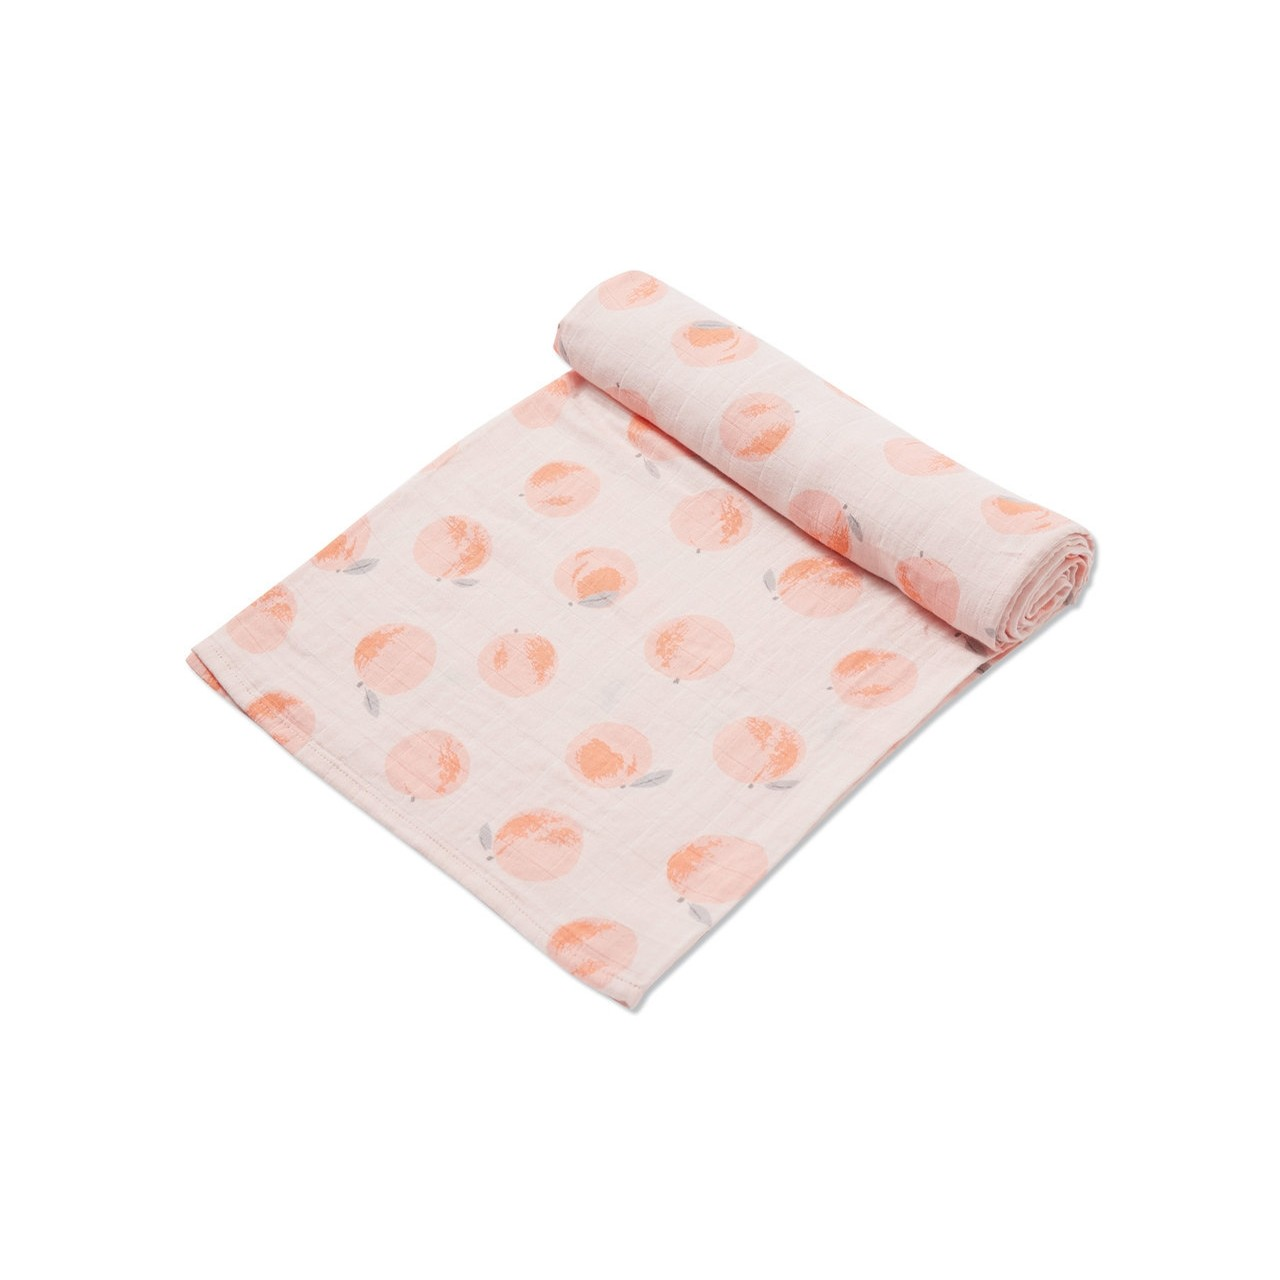 Swaddle Blanket - Peachy